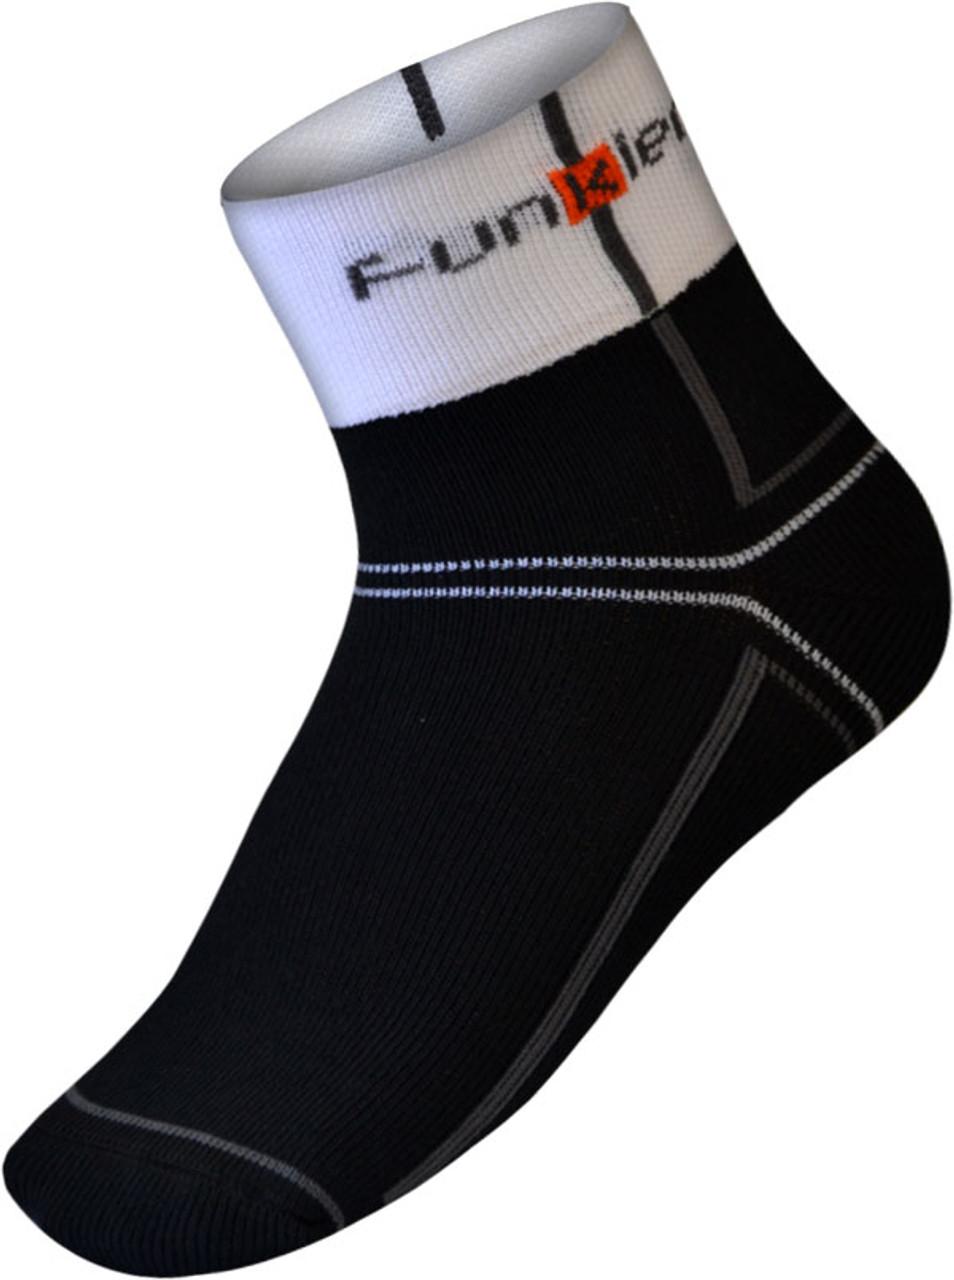 Funkier Lorca Winter Thermo-lite Socks | Black/White | SK-44